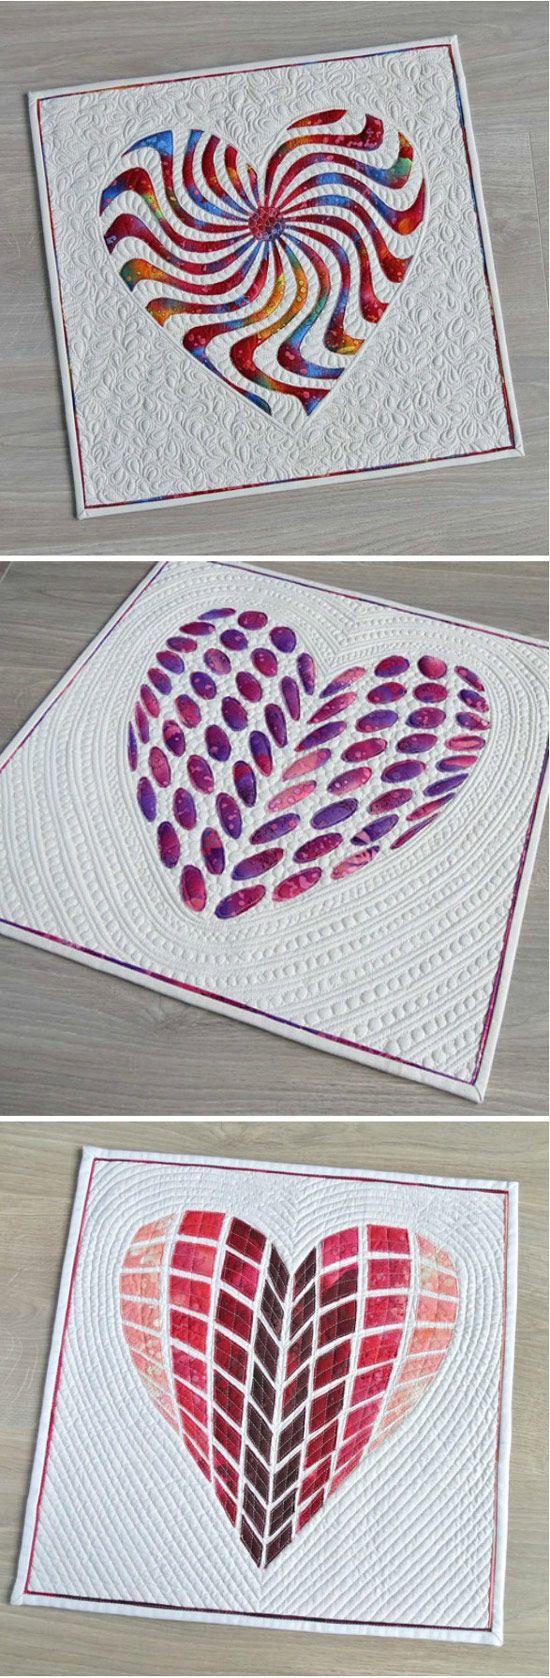 Applique heart quilt patterns- multiple designs available. via @getagrama